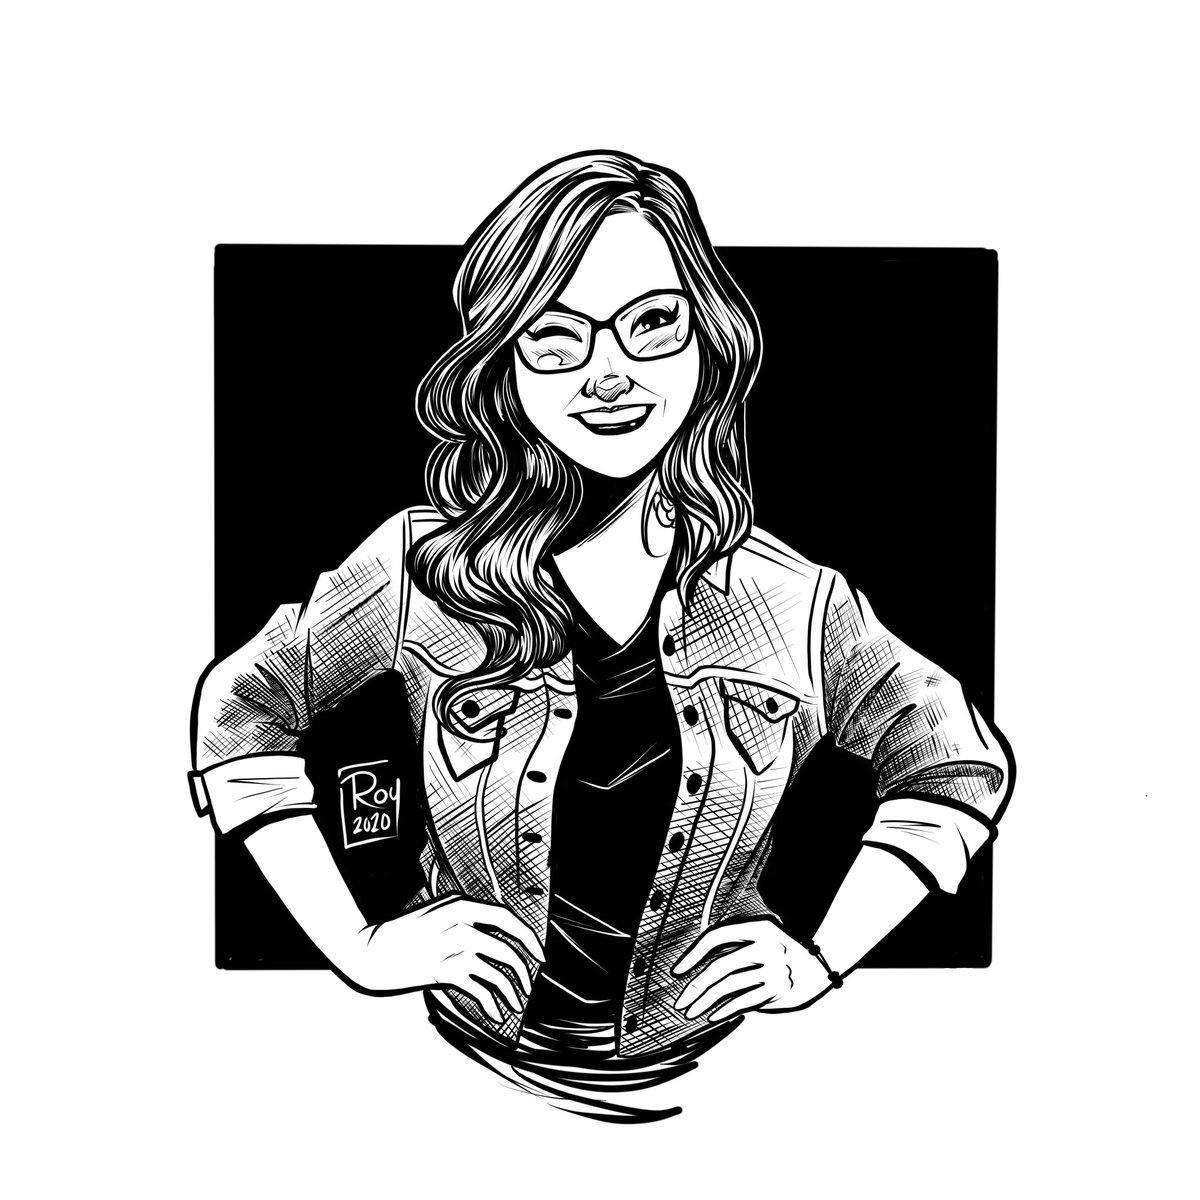 @Dany_Kino   #sketch #blackandwhite #digital #procreate #hatched #illustration #danykino #geekgirl #techie https://t.co/grzBRrhovJ